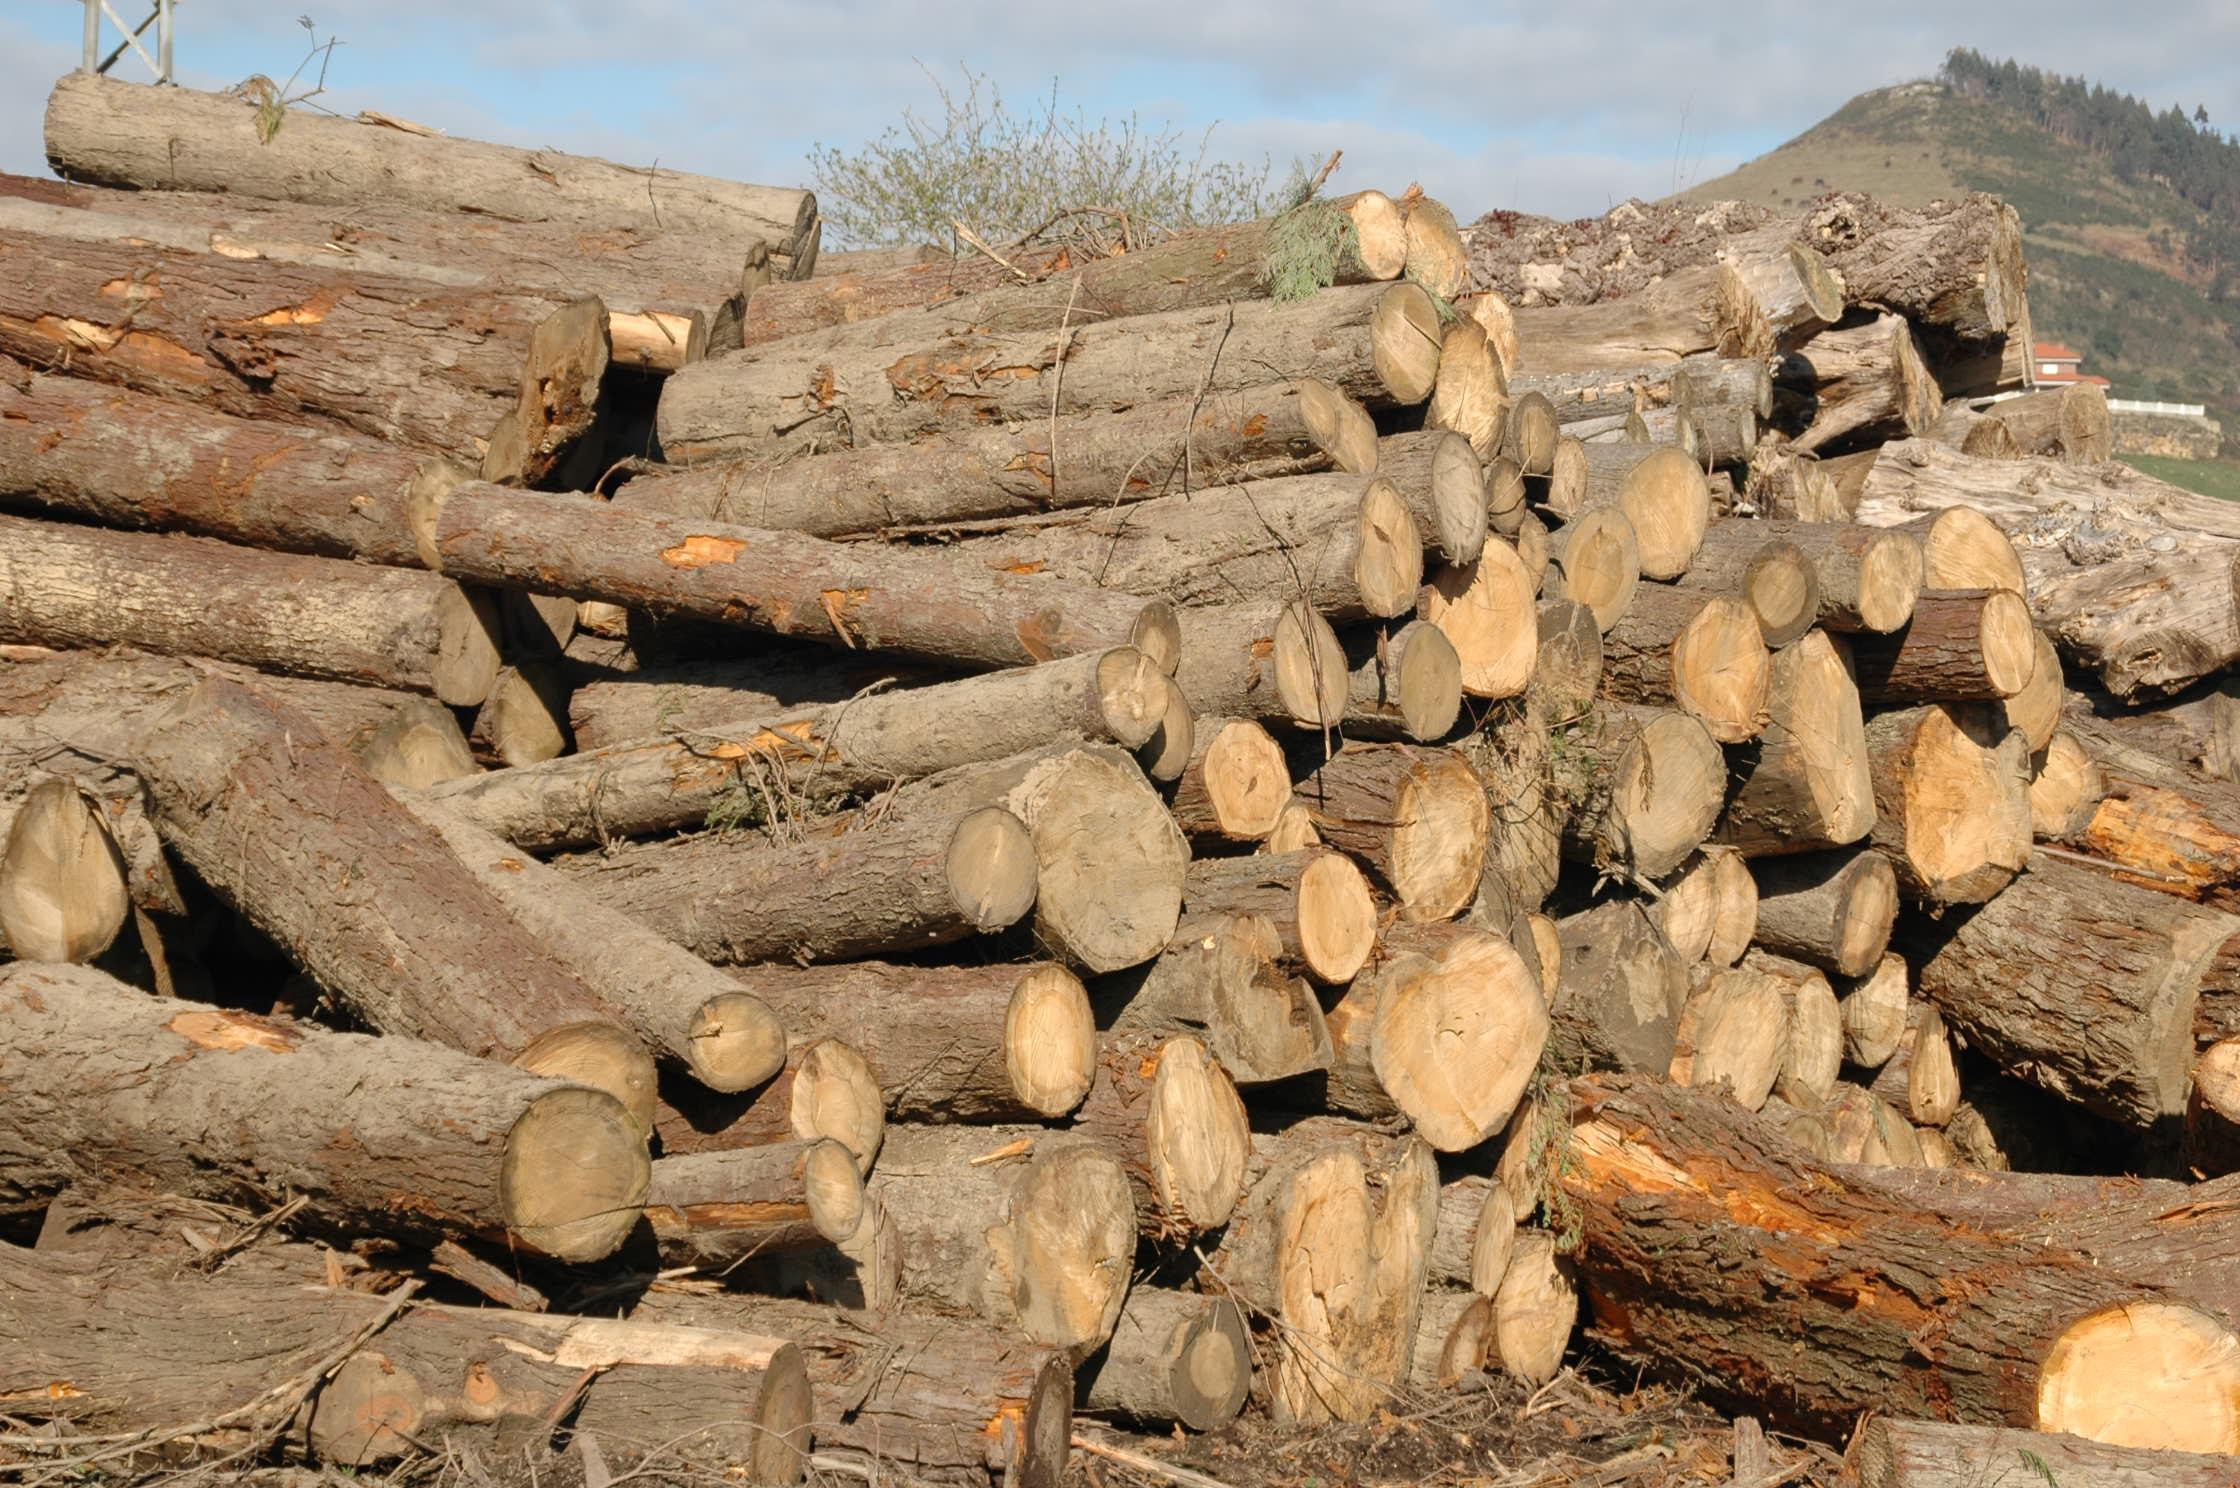 Madera en rollo maderas ingelmo s l fabricaci n de - Transferir fotos a madera ...